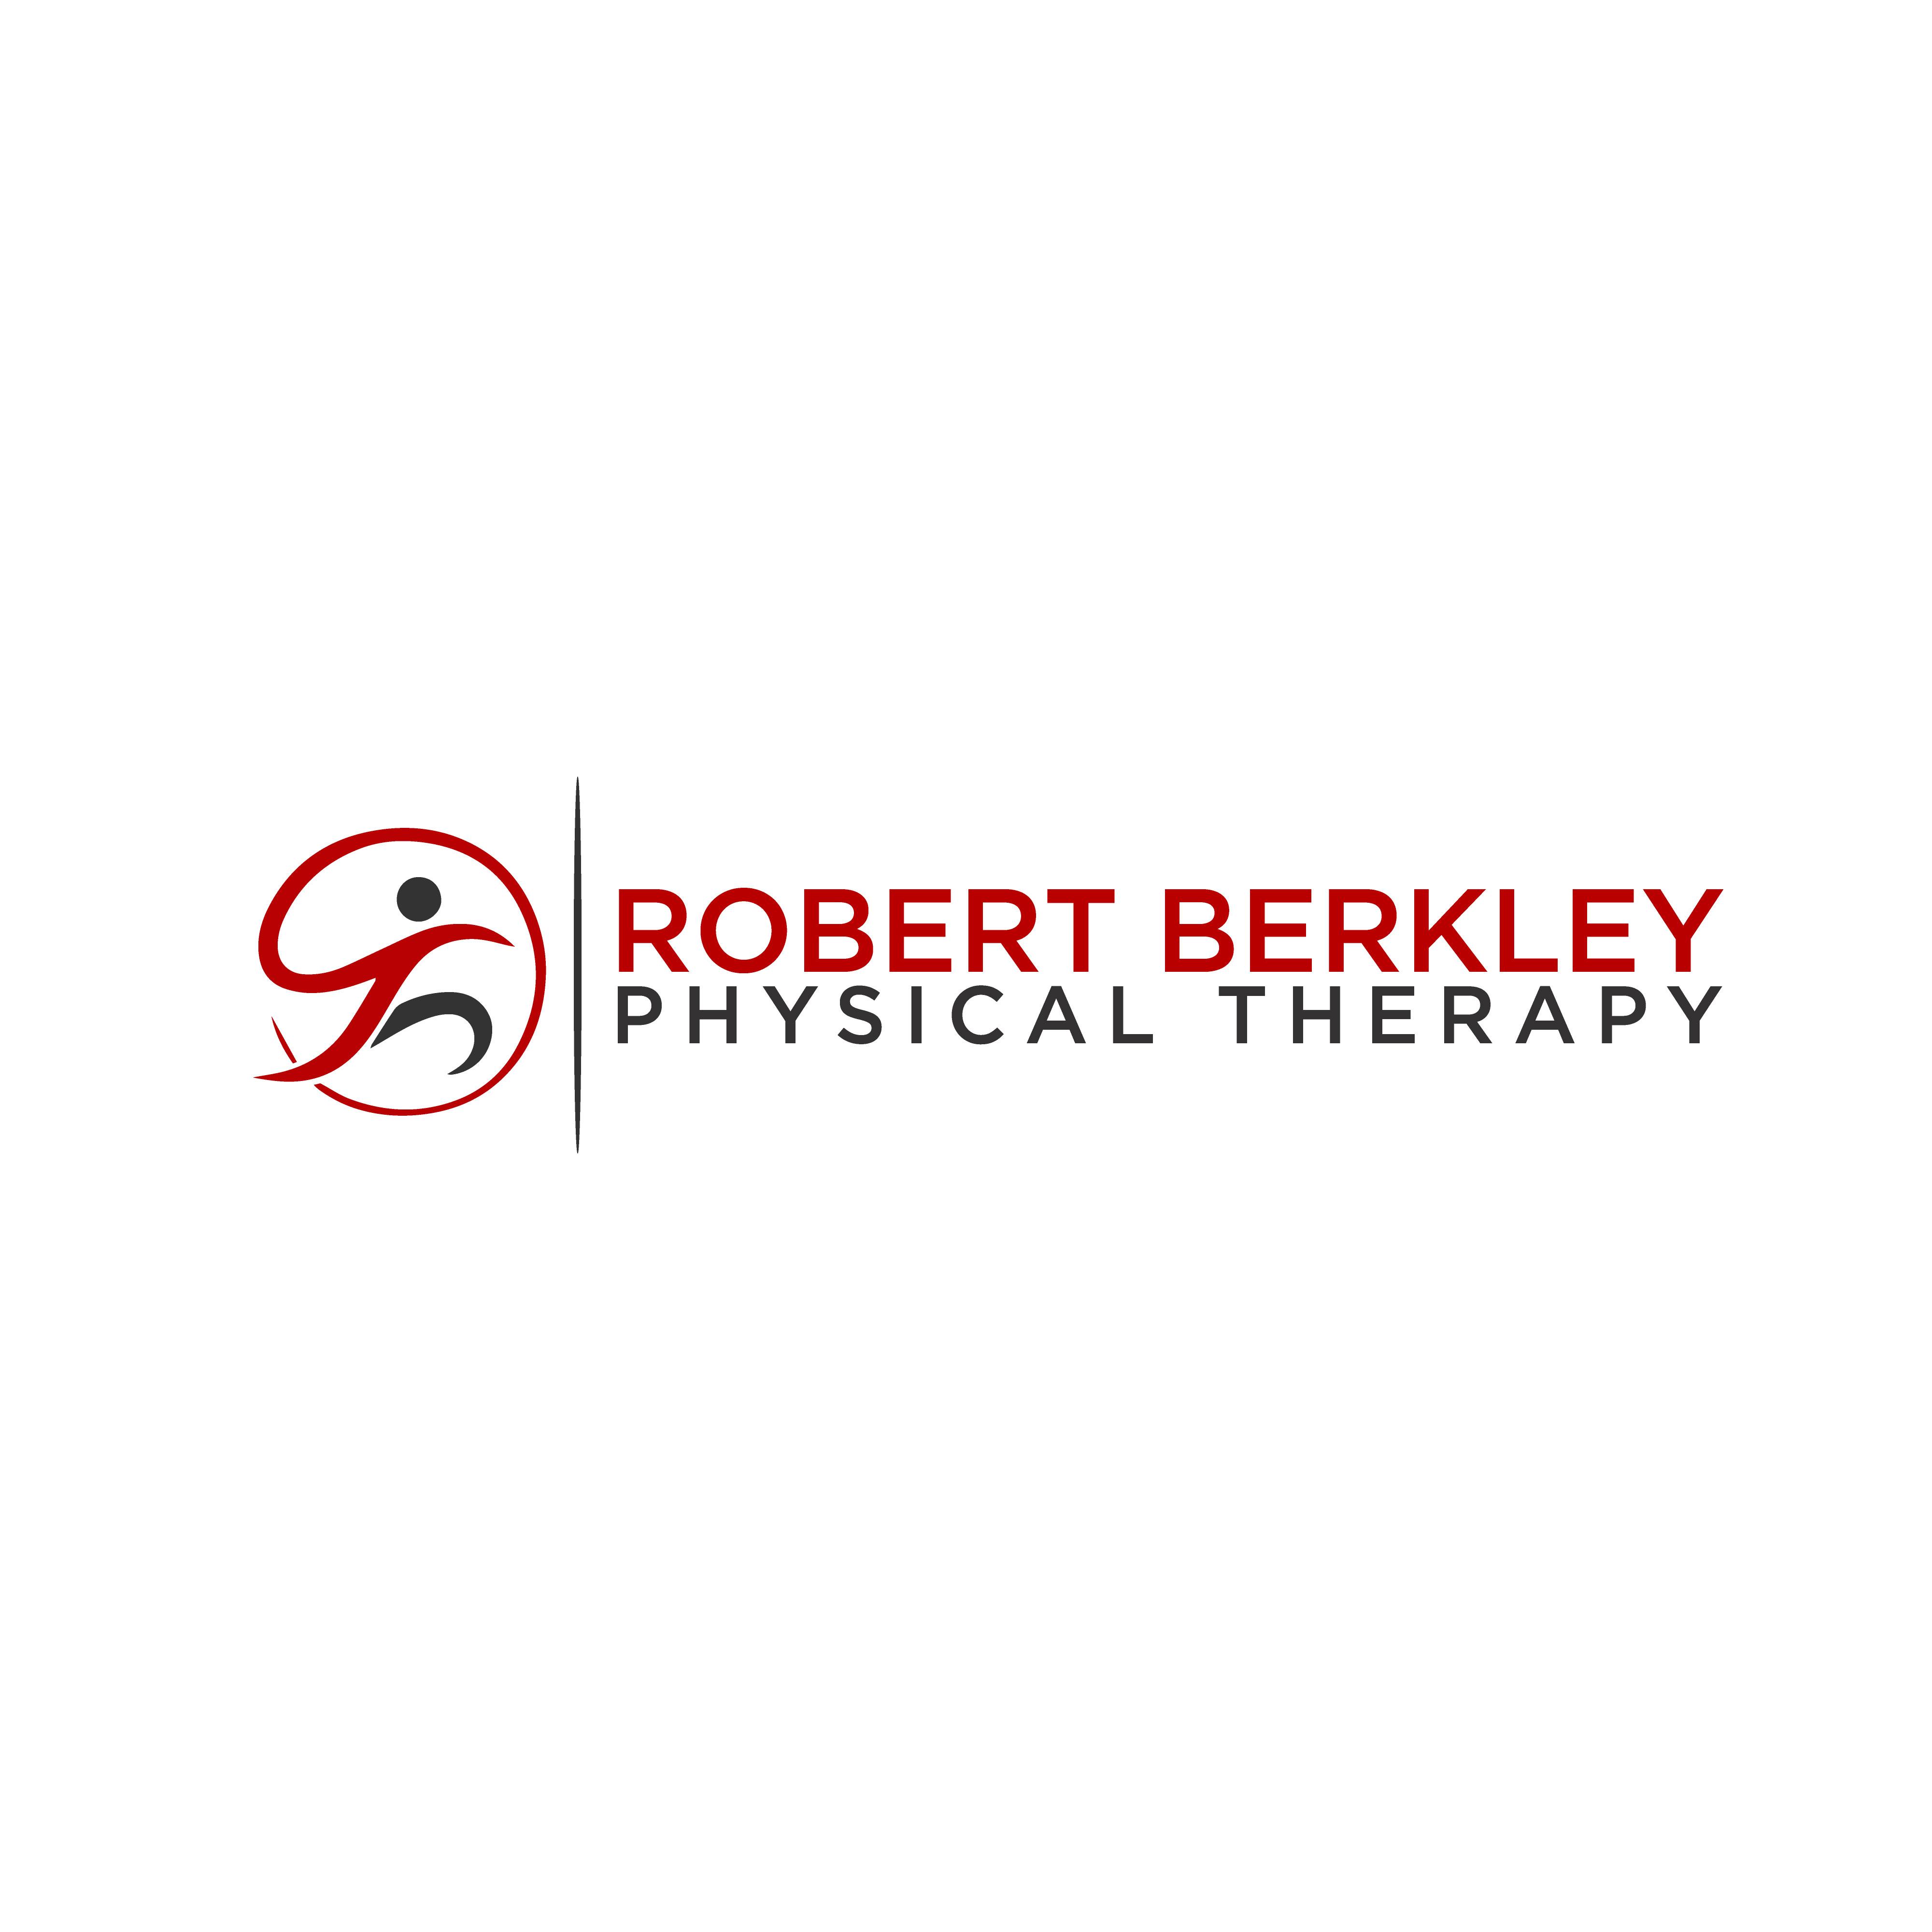 Robert Berkley Physical Therapy